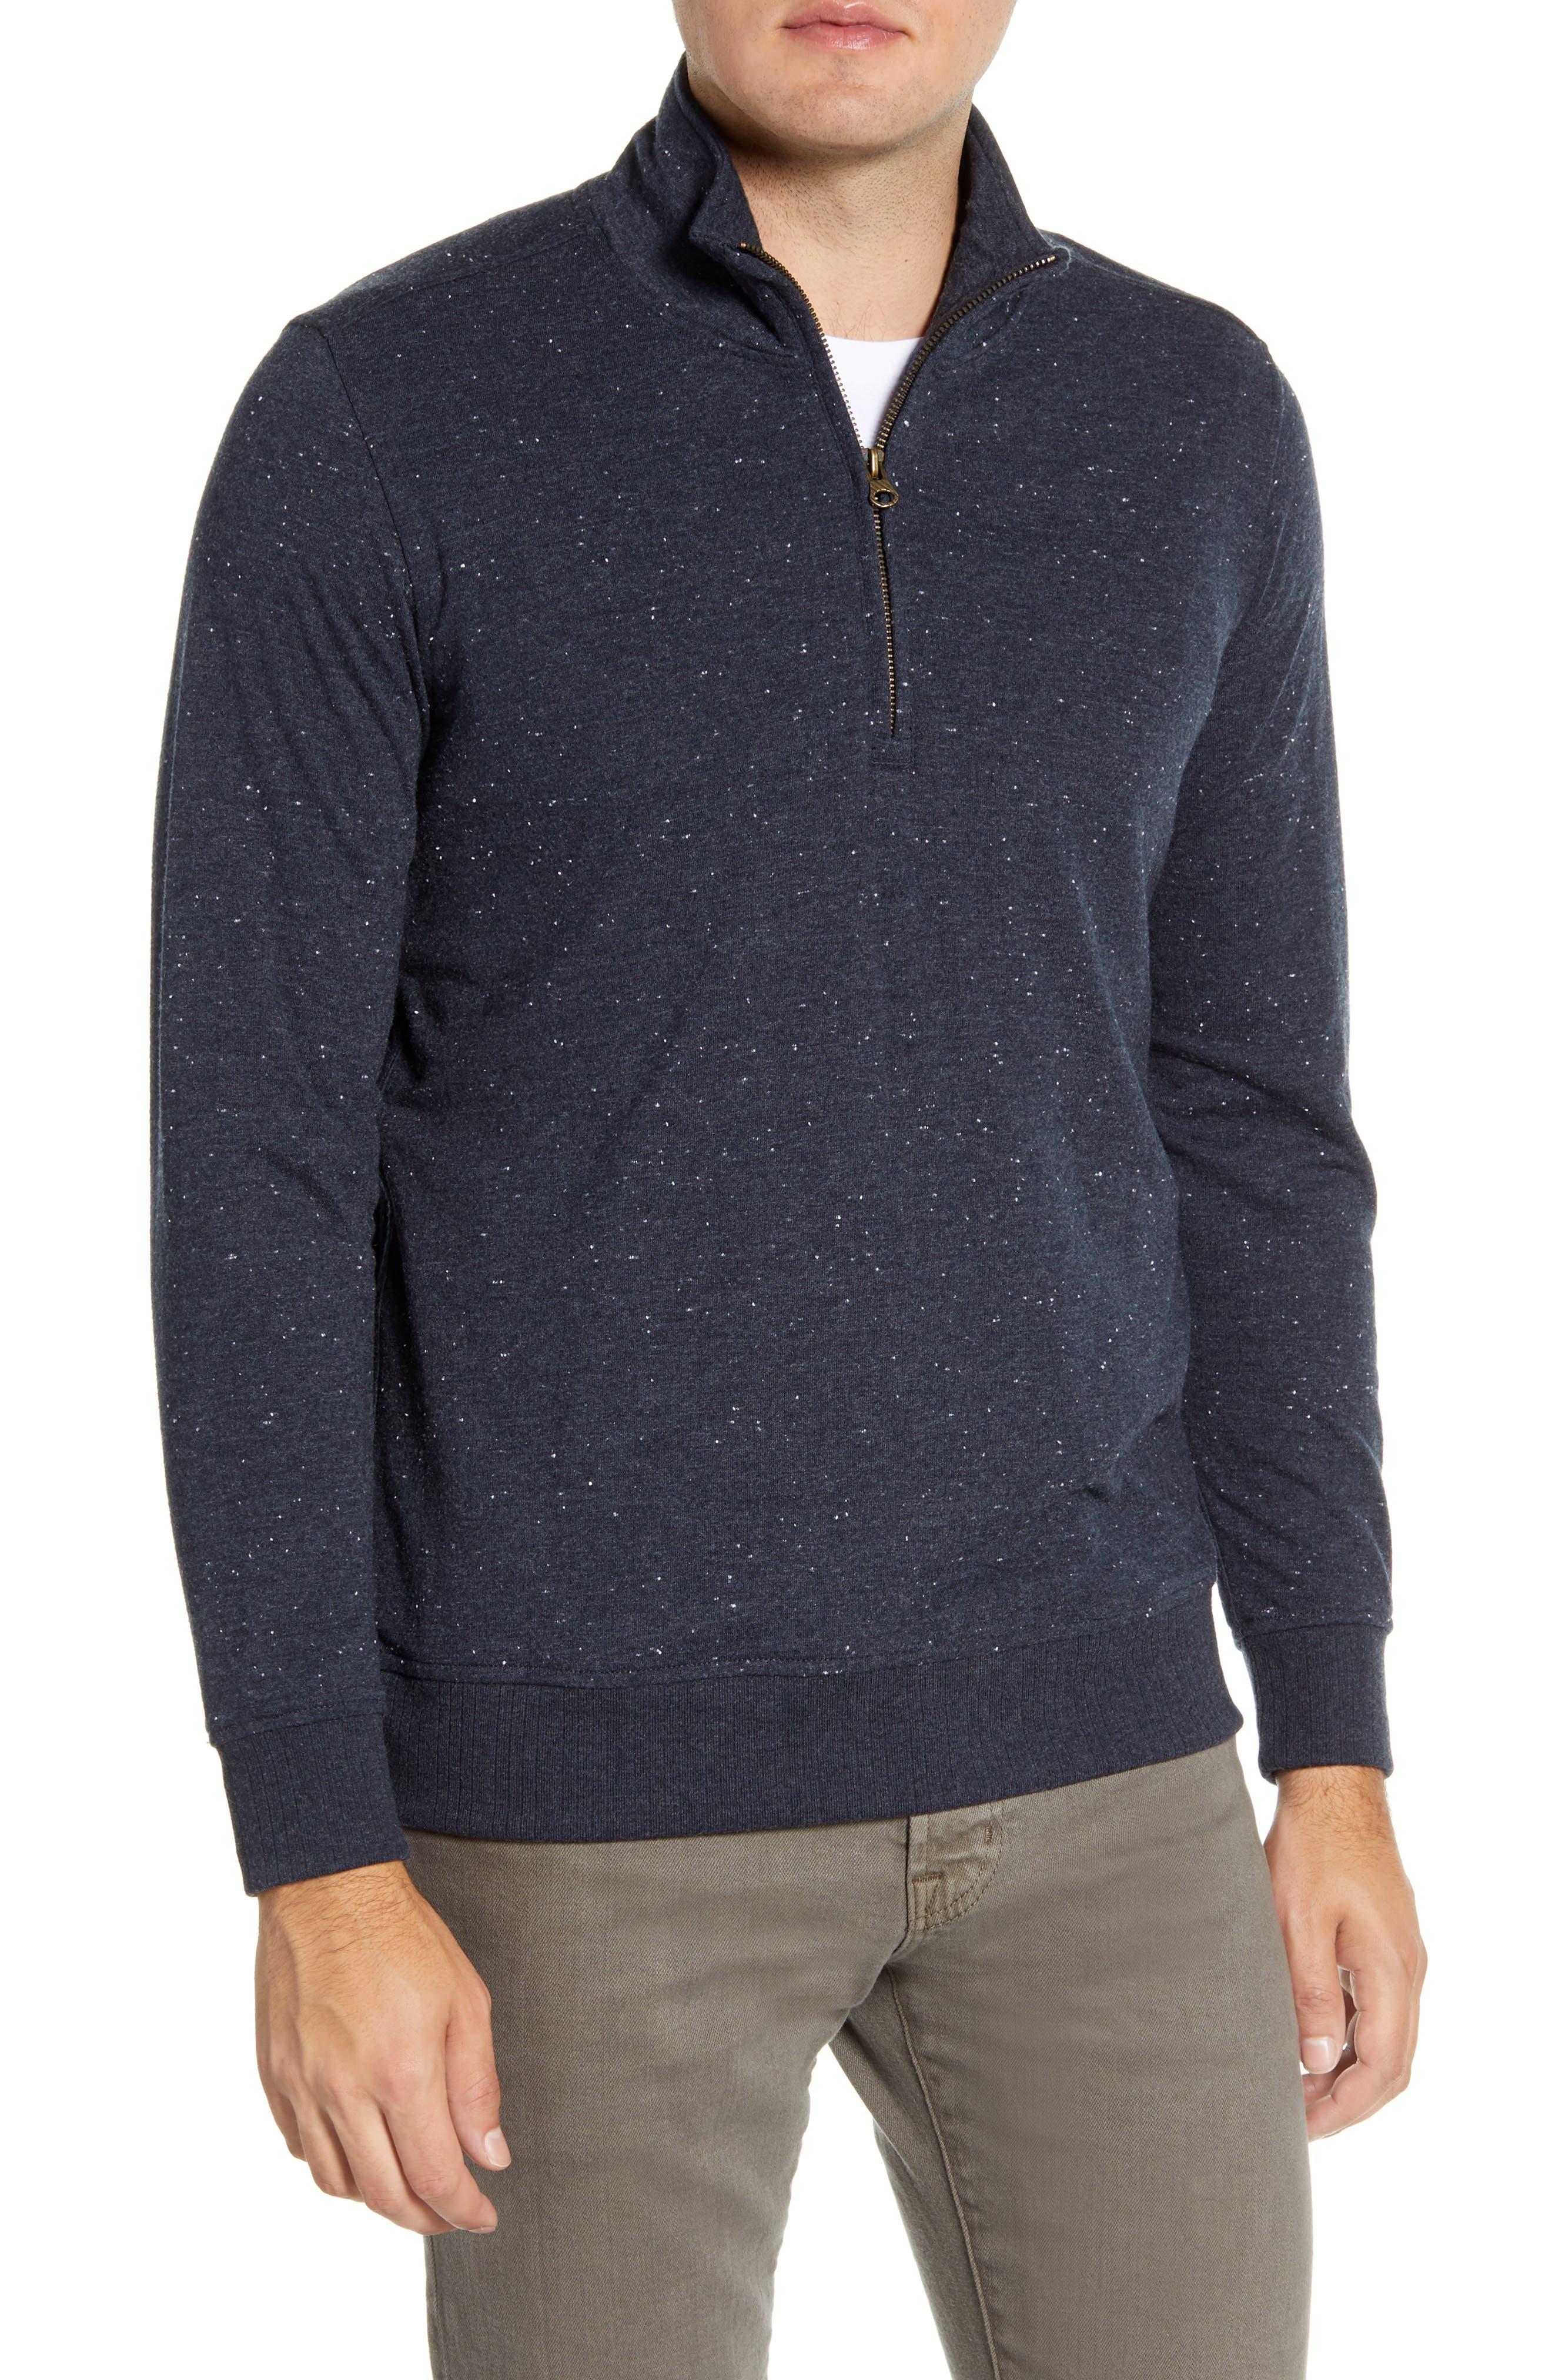 Cotton Blend Quarter Zip Pullover